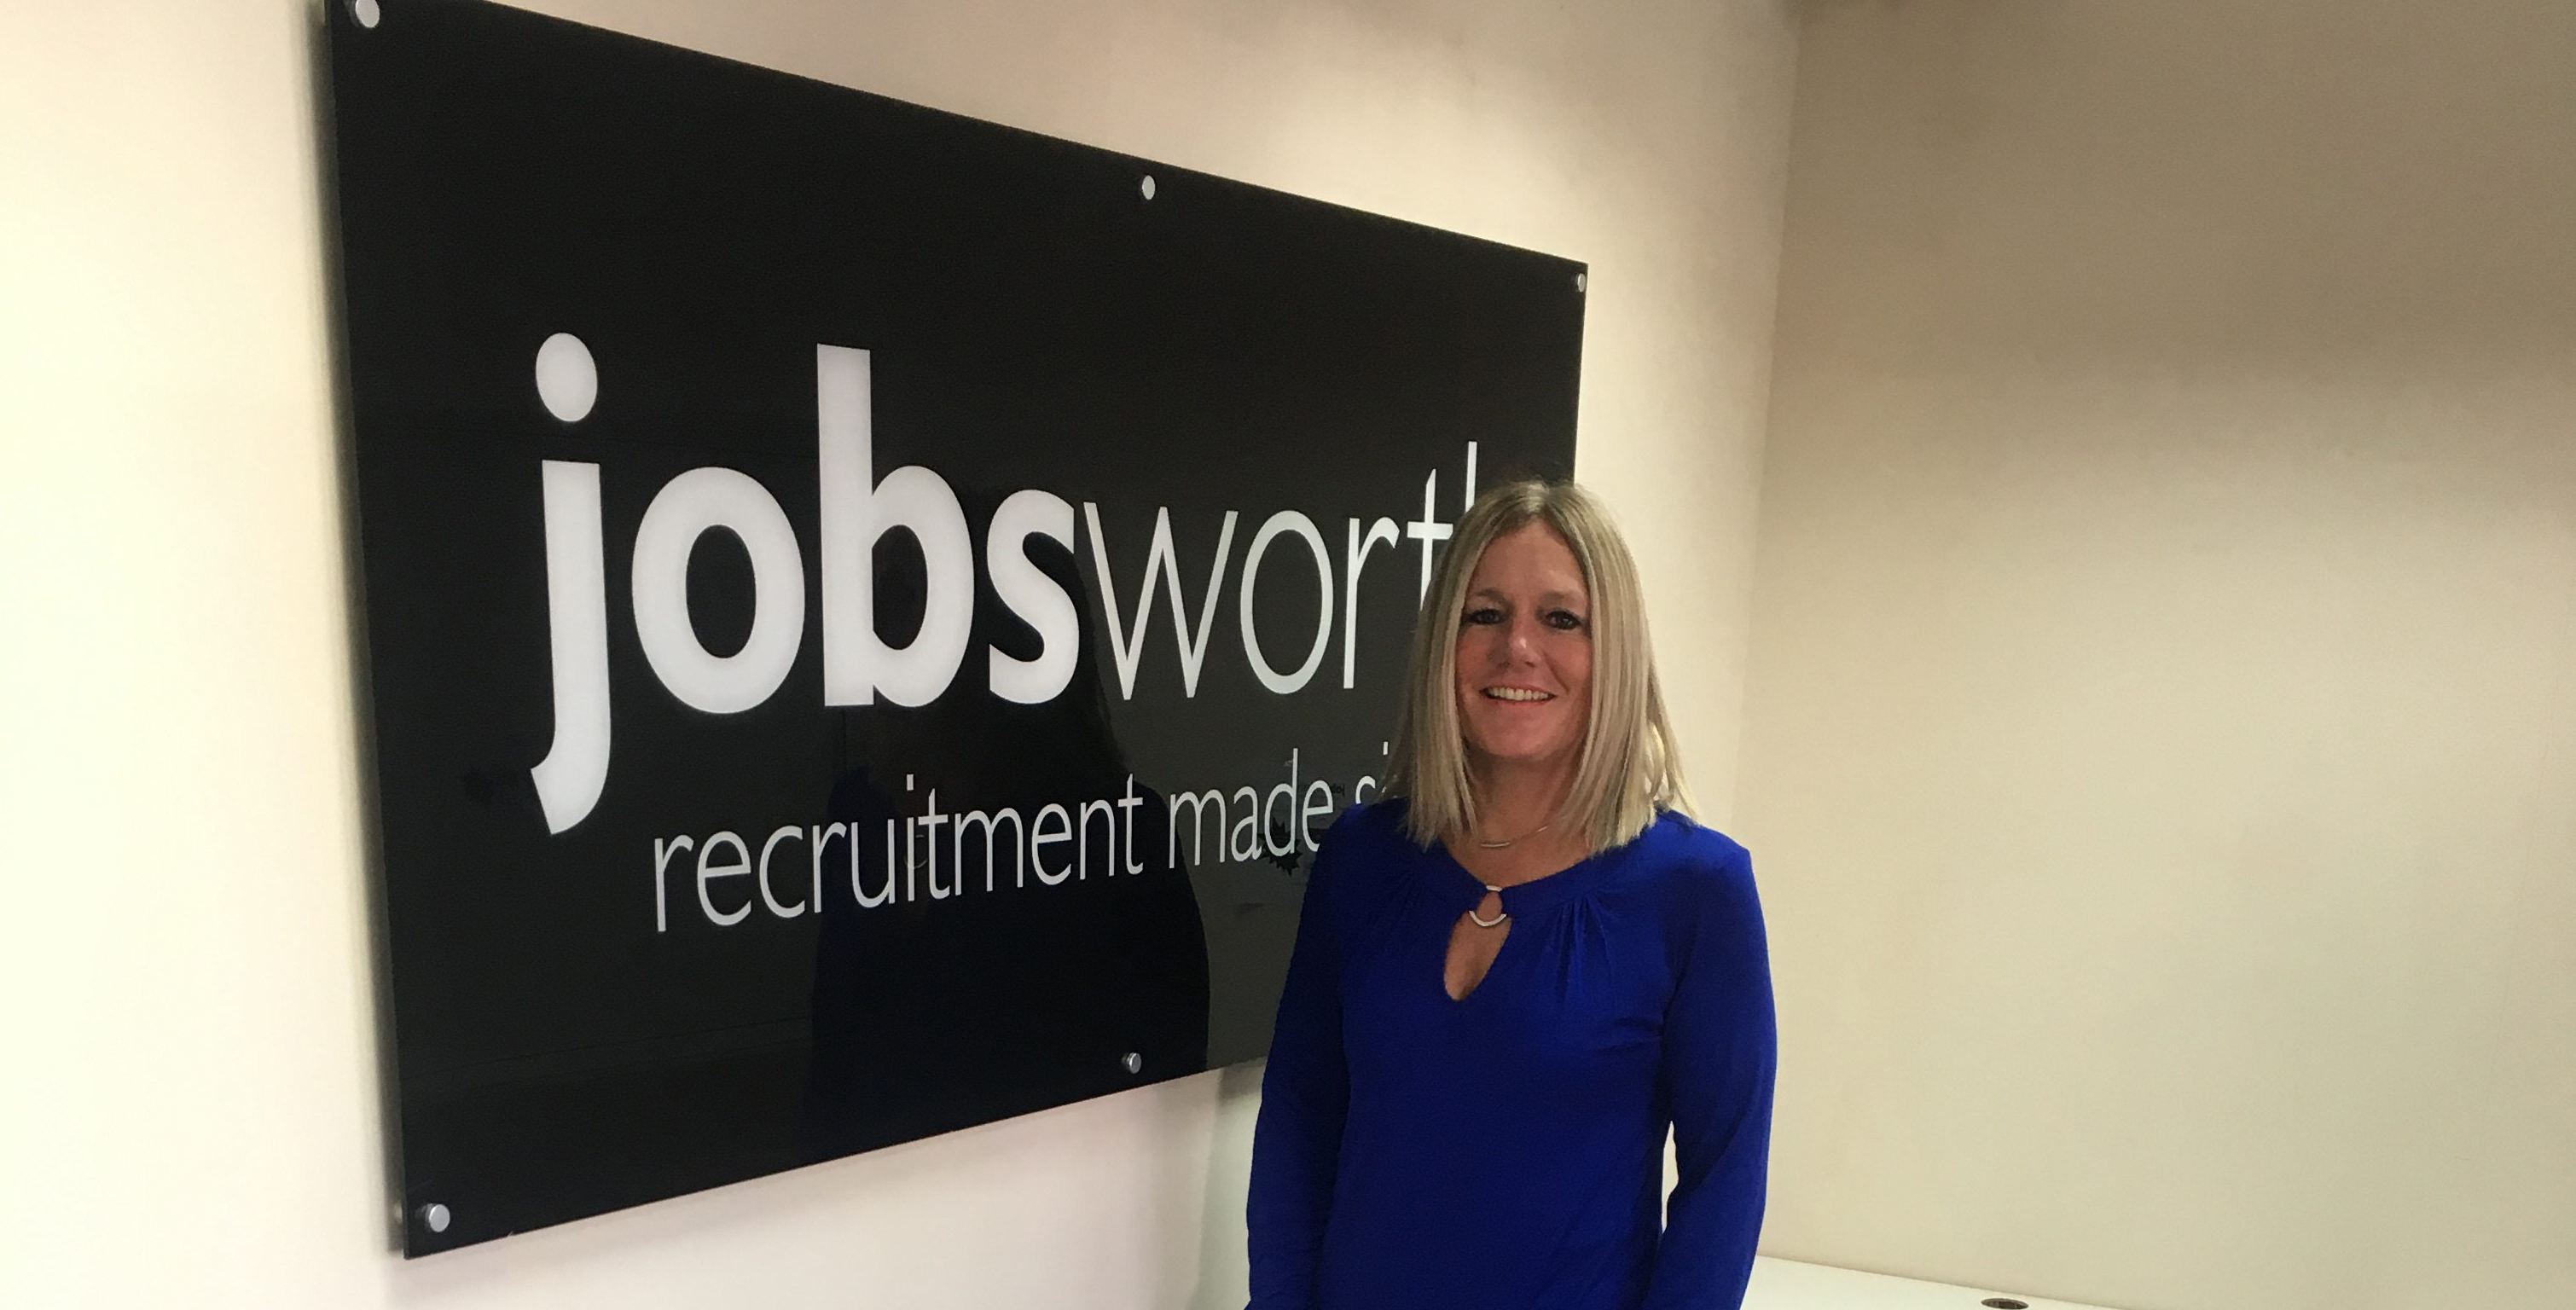 Employee Sarah stood infront of Jobsworth sign